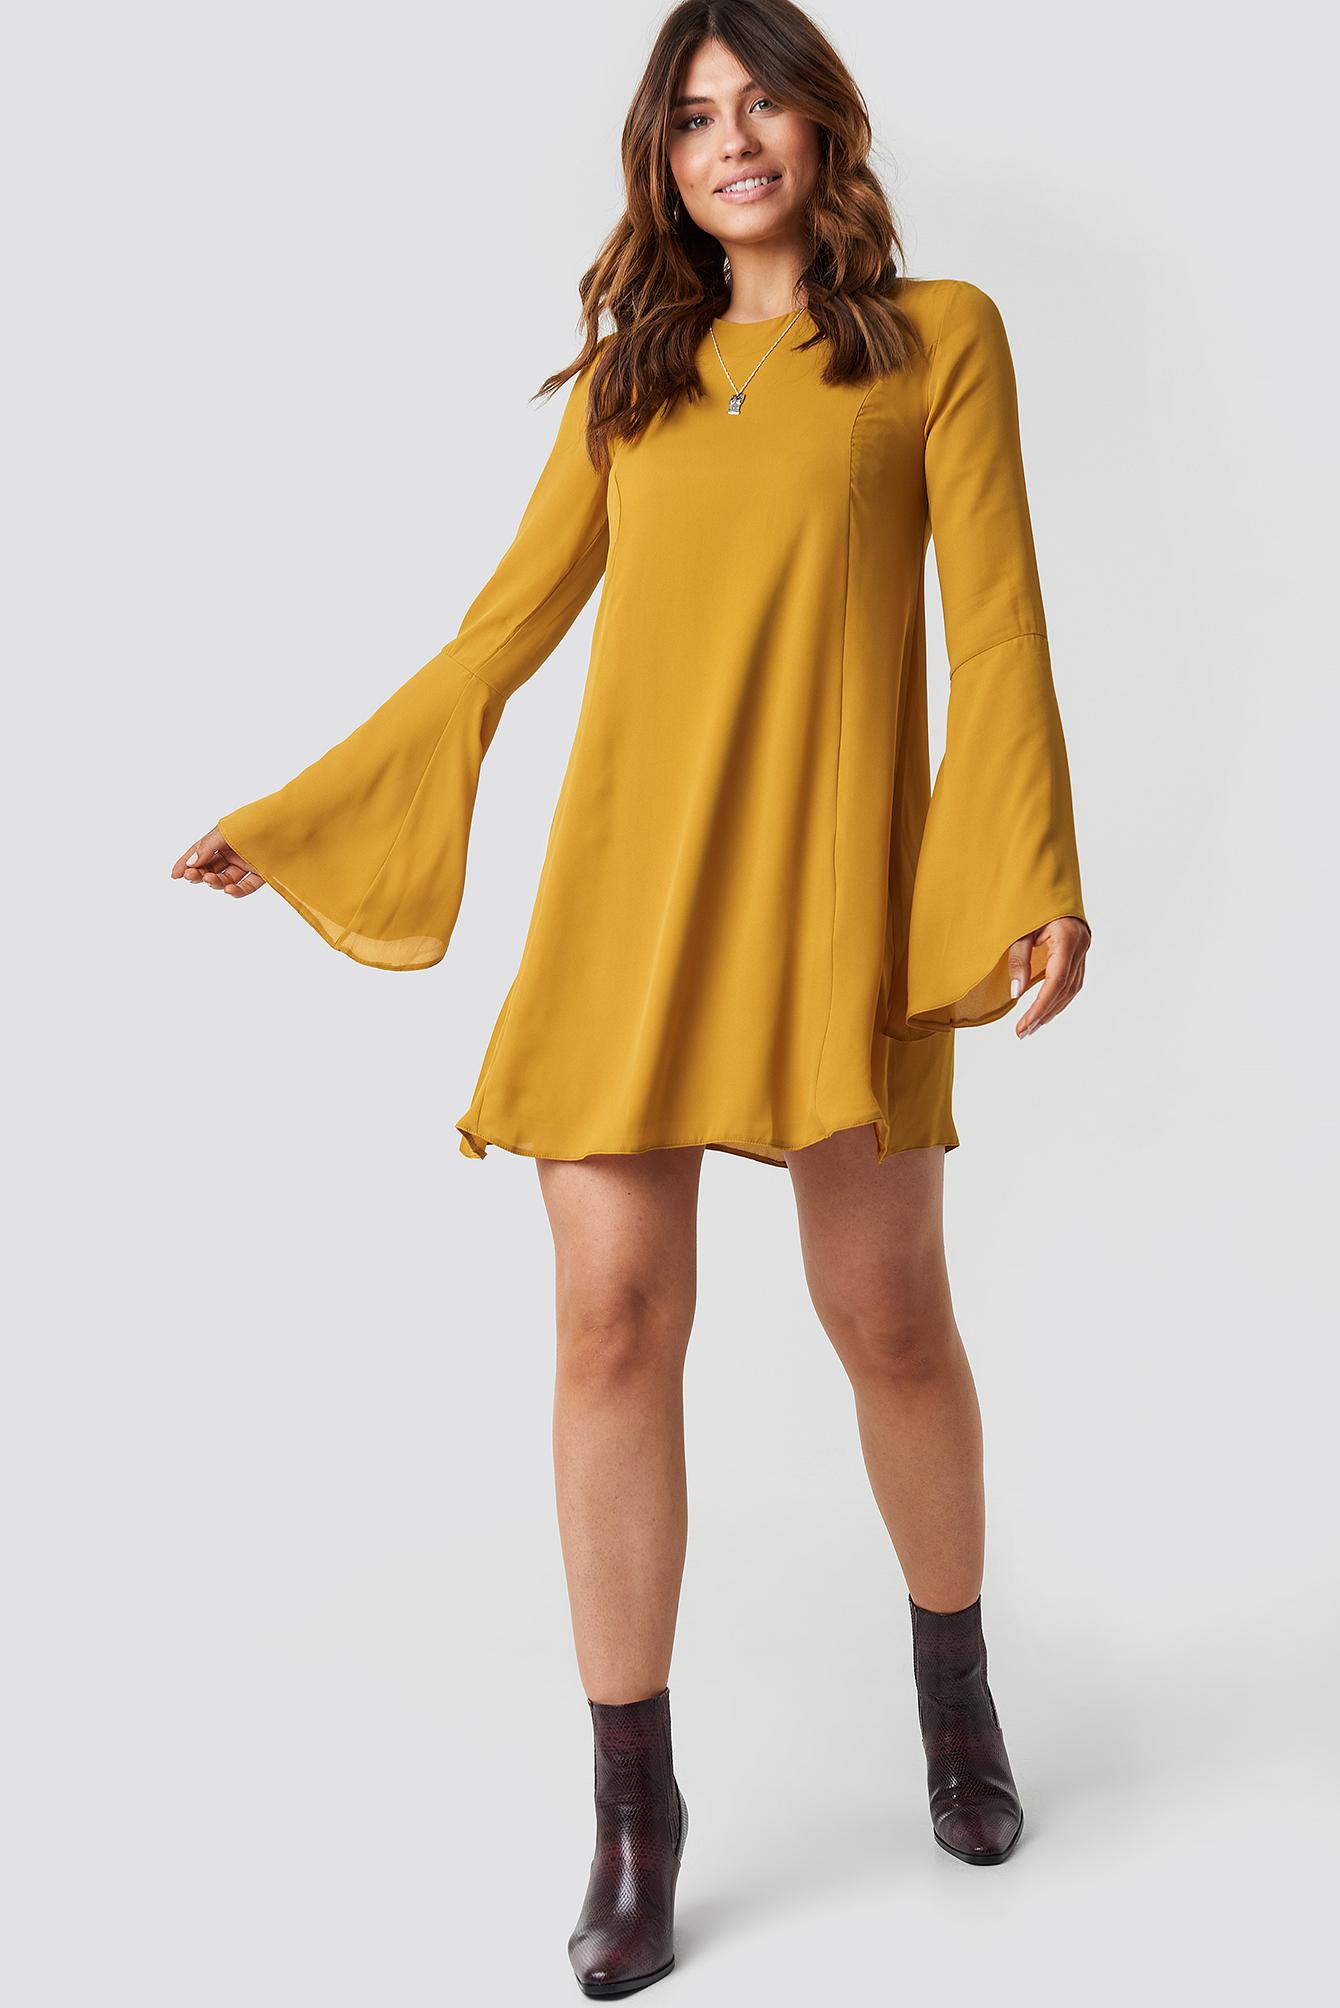 Handles Flywheel Mini Dress NA-KD.COM